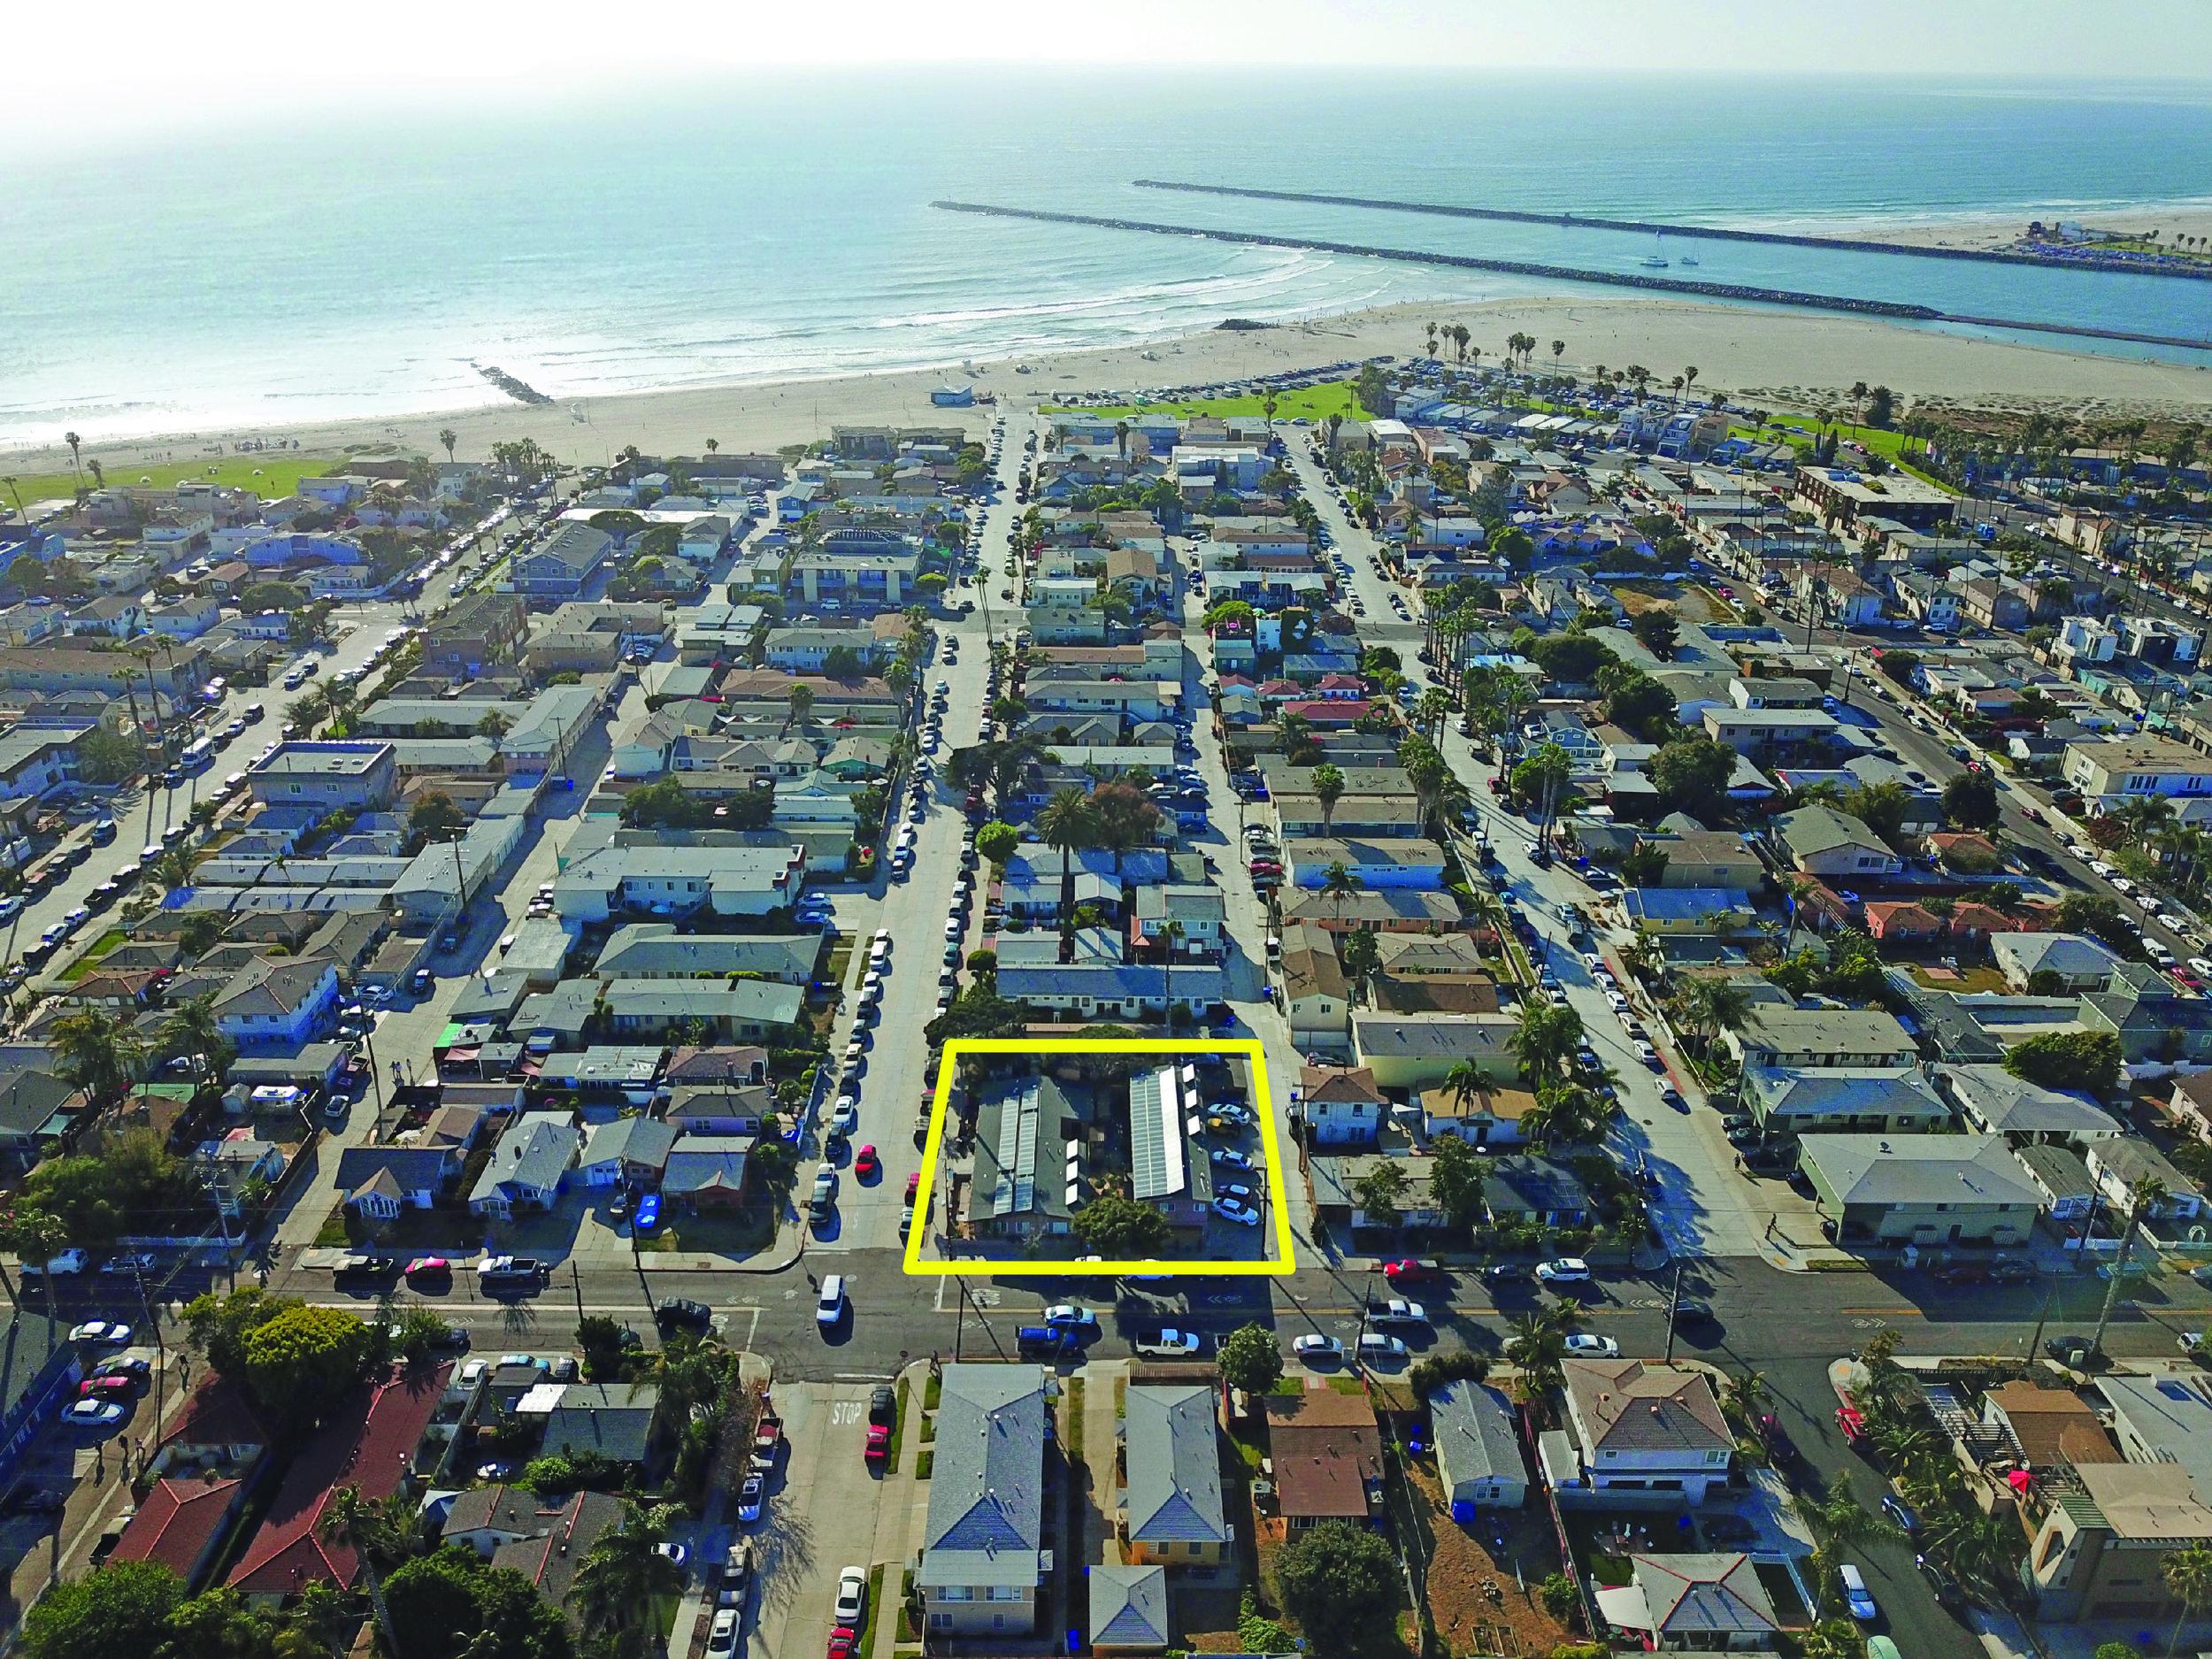 2104-10 Bacon Street - Ocean Beach11 Units$3,050,000